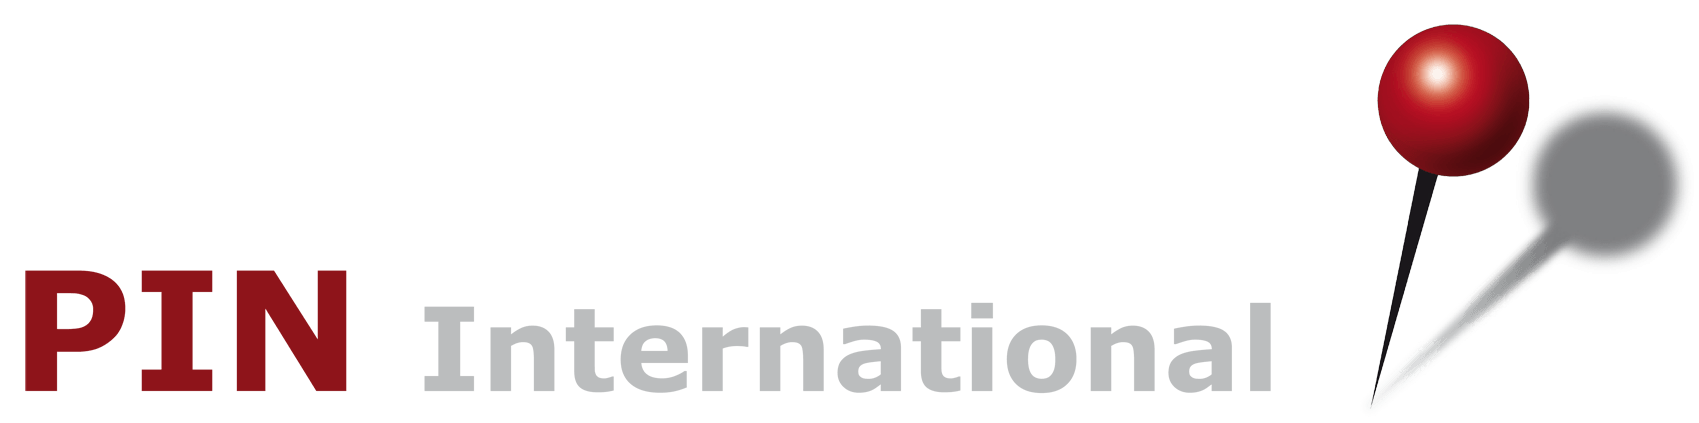 PIN International